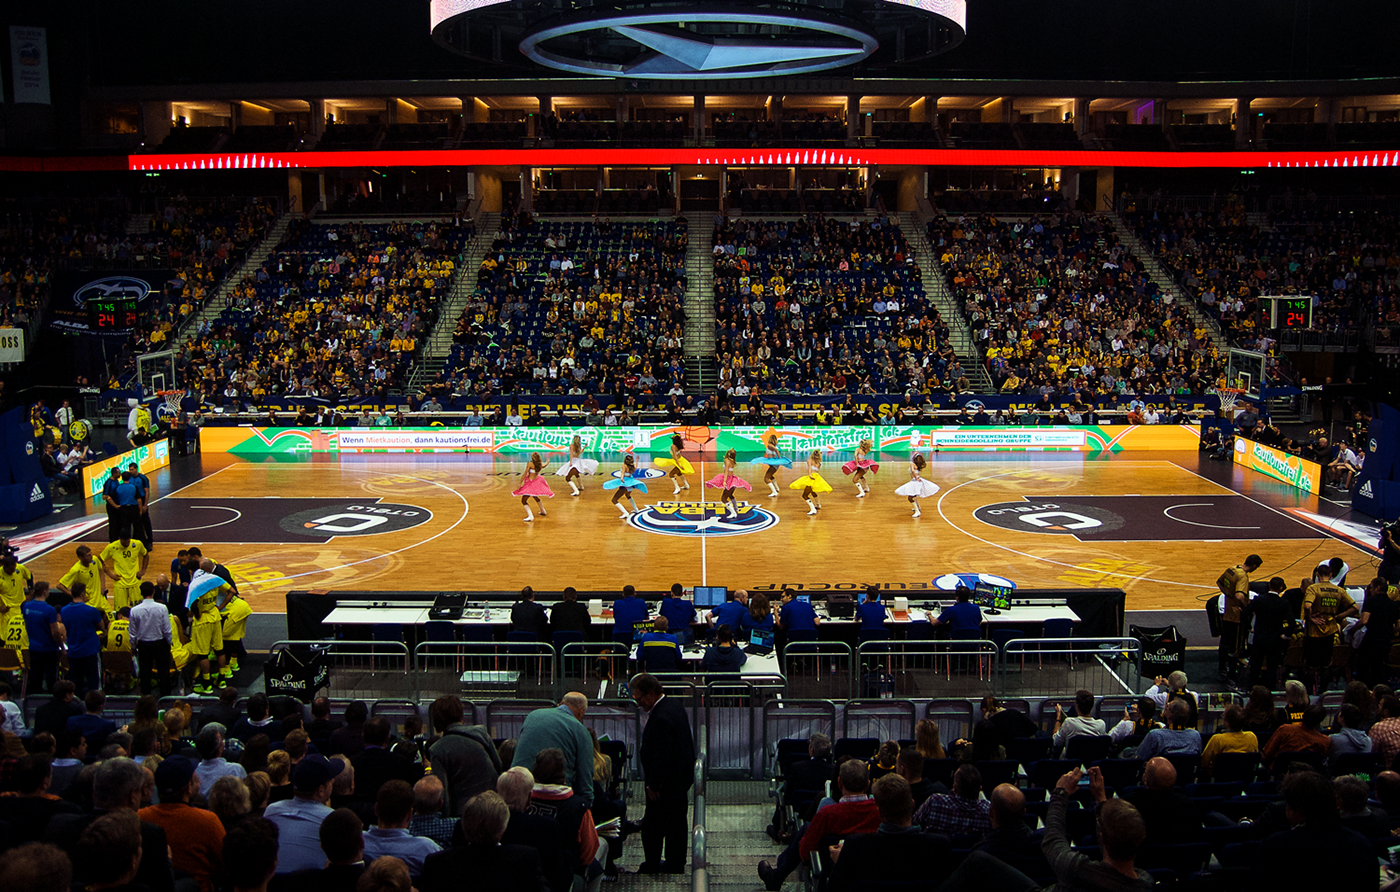 Virtueller arena mercedes benz sitzplan berlin Virtuelle Arena